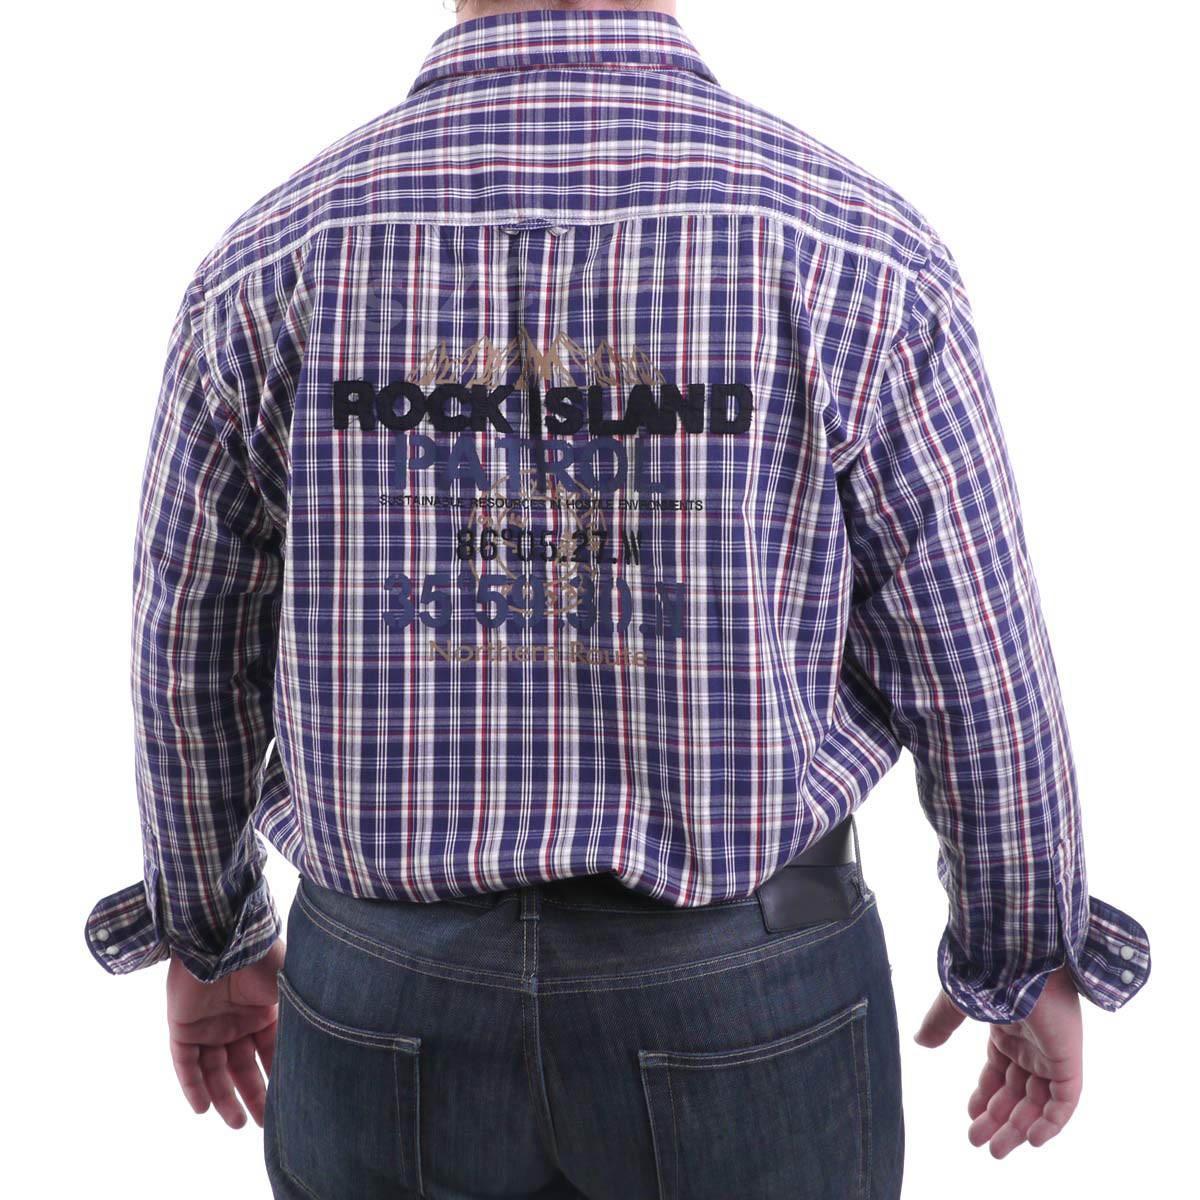 Recherche chemise homme grande taille